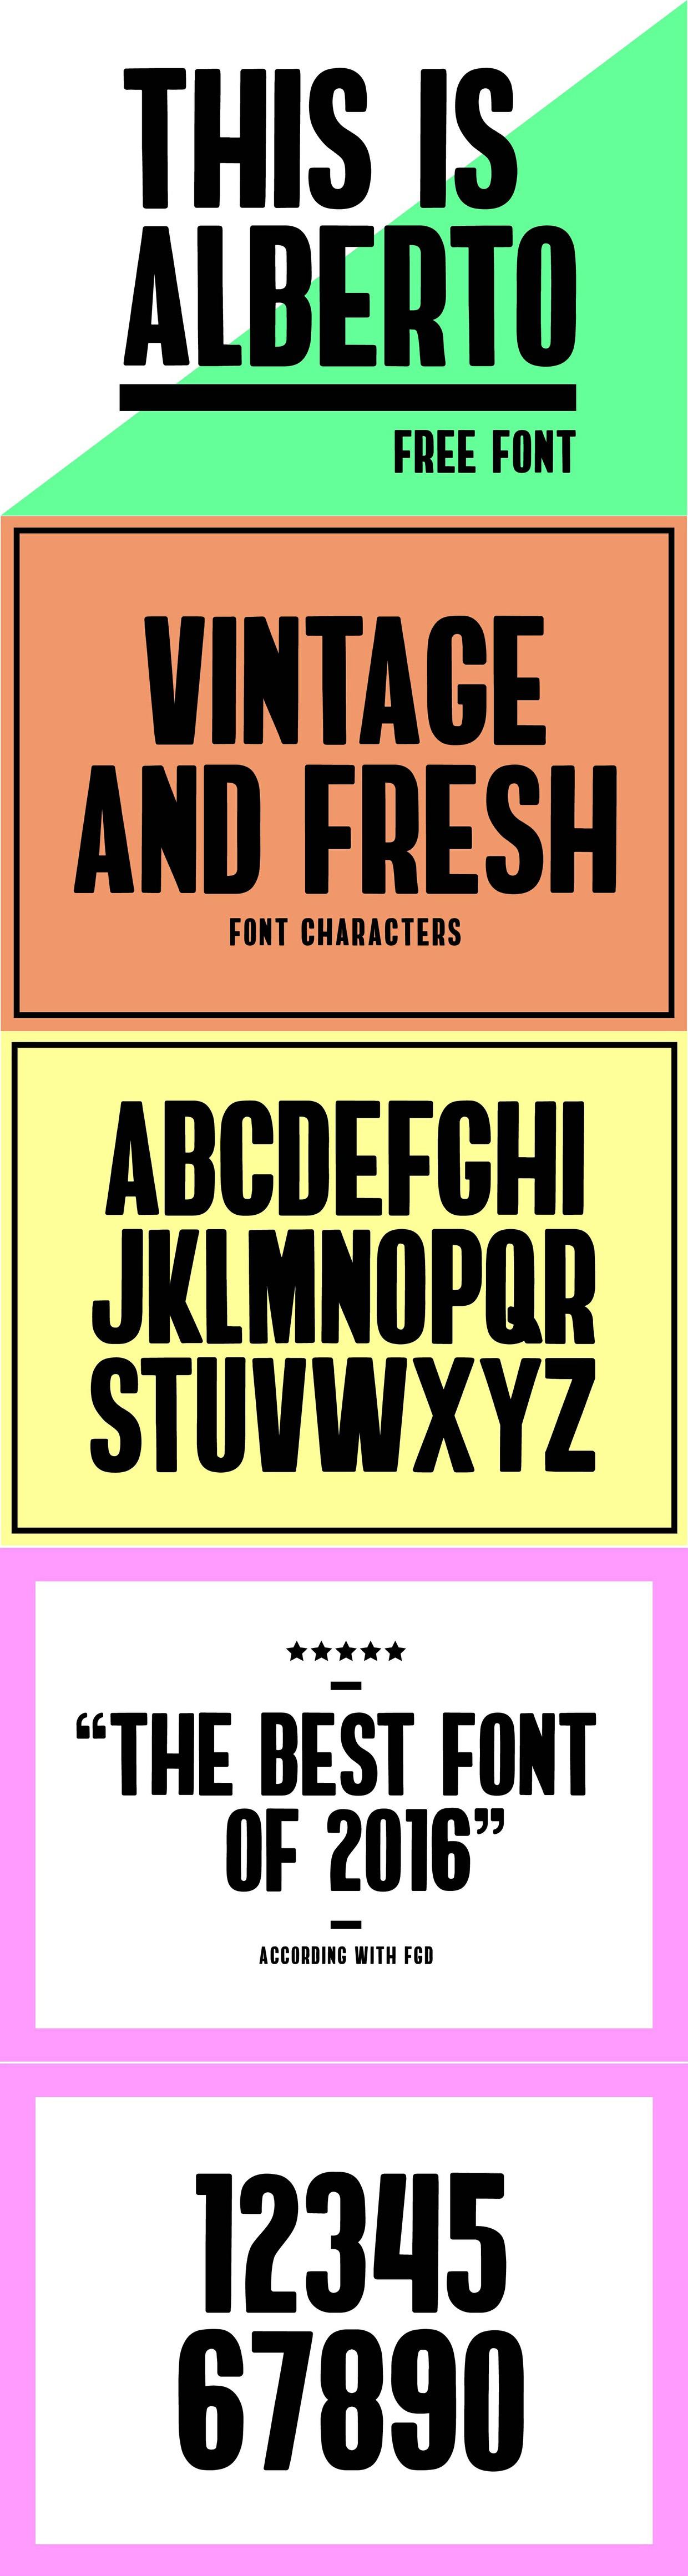 Alberto font typeface